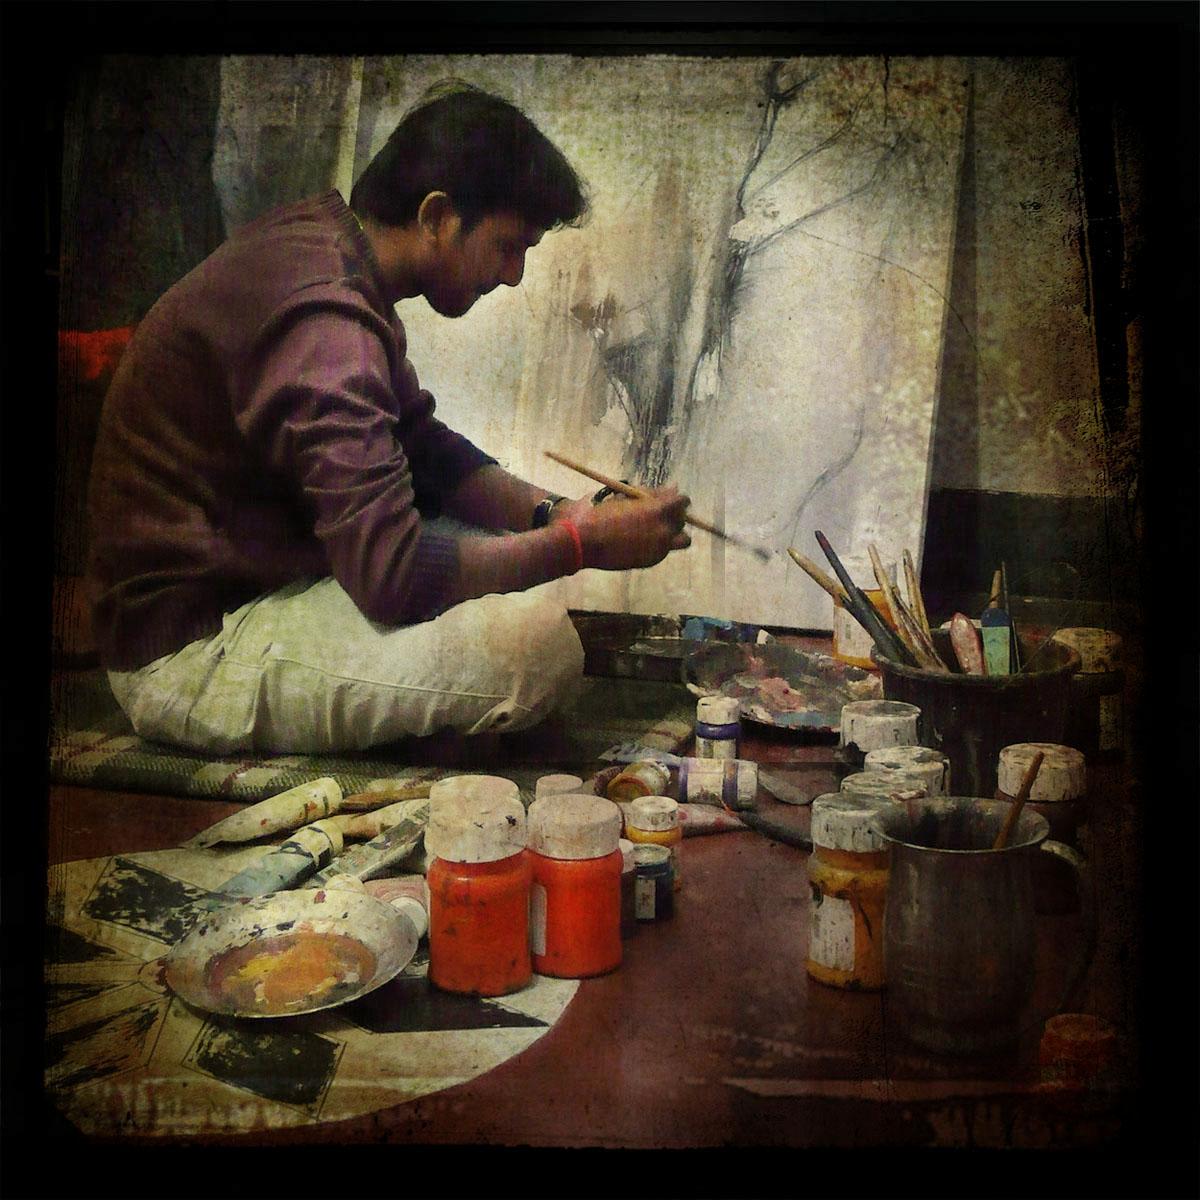 artist as entrepreneur paul calendrillo